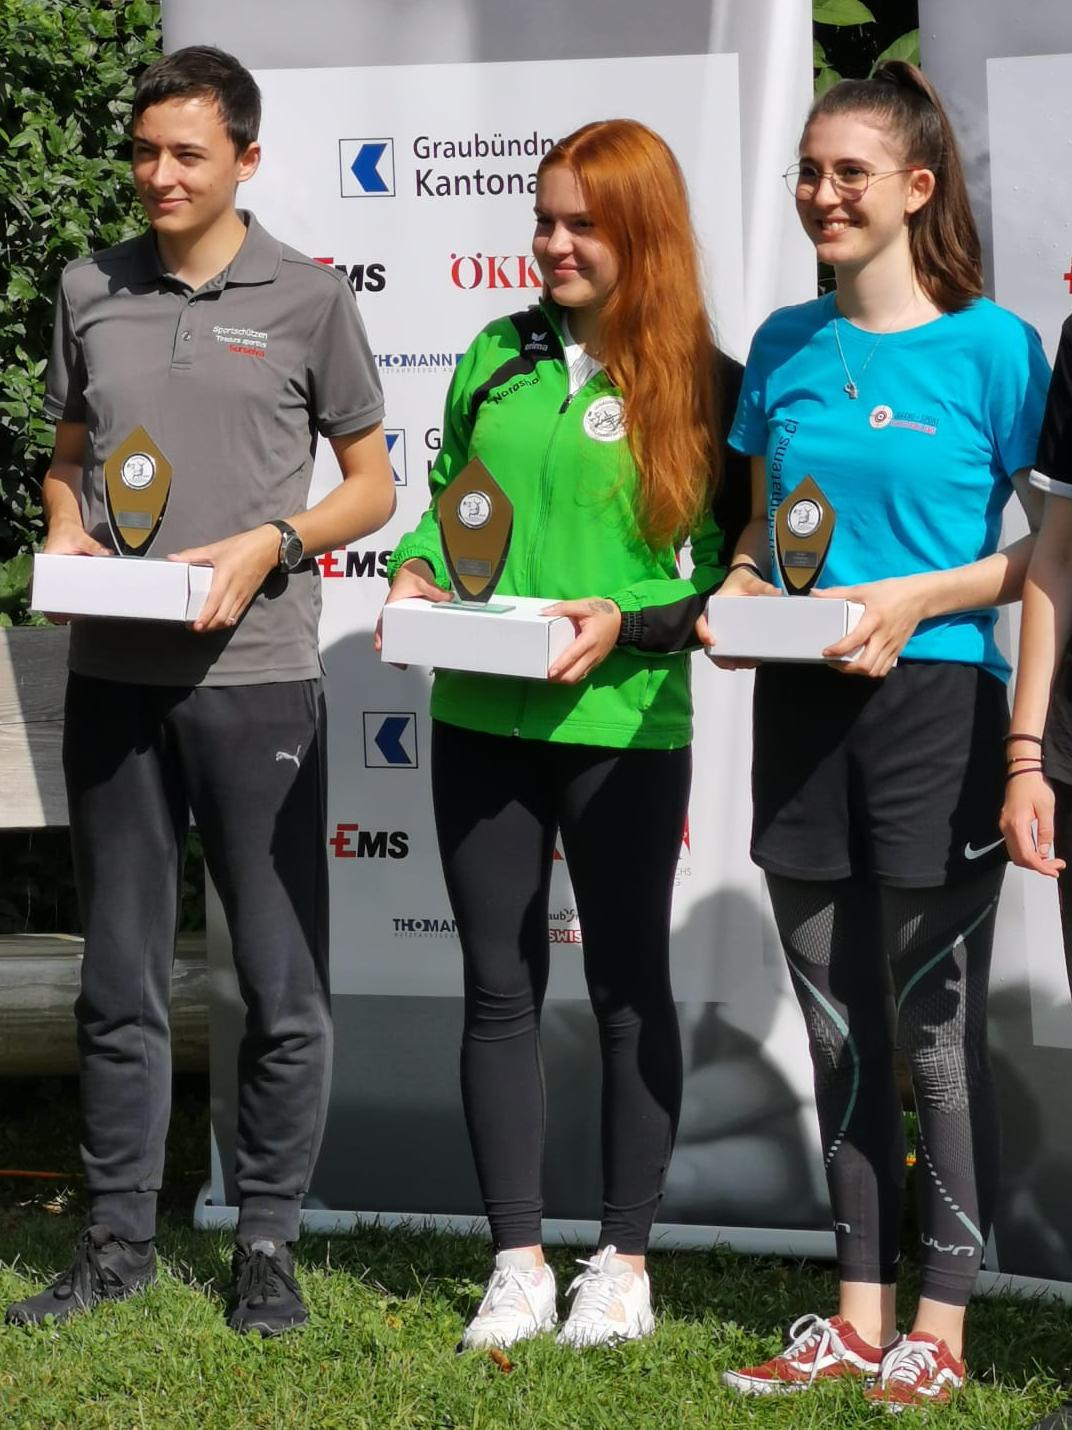 Bündner Jugendtag 2020 50m 3-Stellung 2. Rang Chris 1. R. NataschaB.  und 3.R. Enrica C.